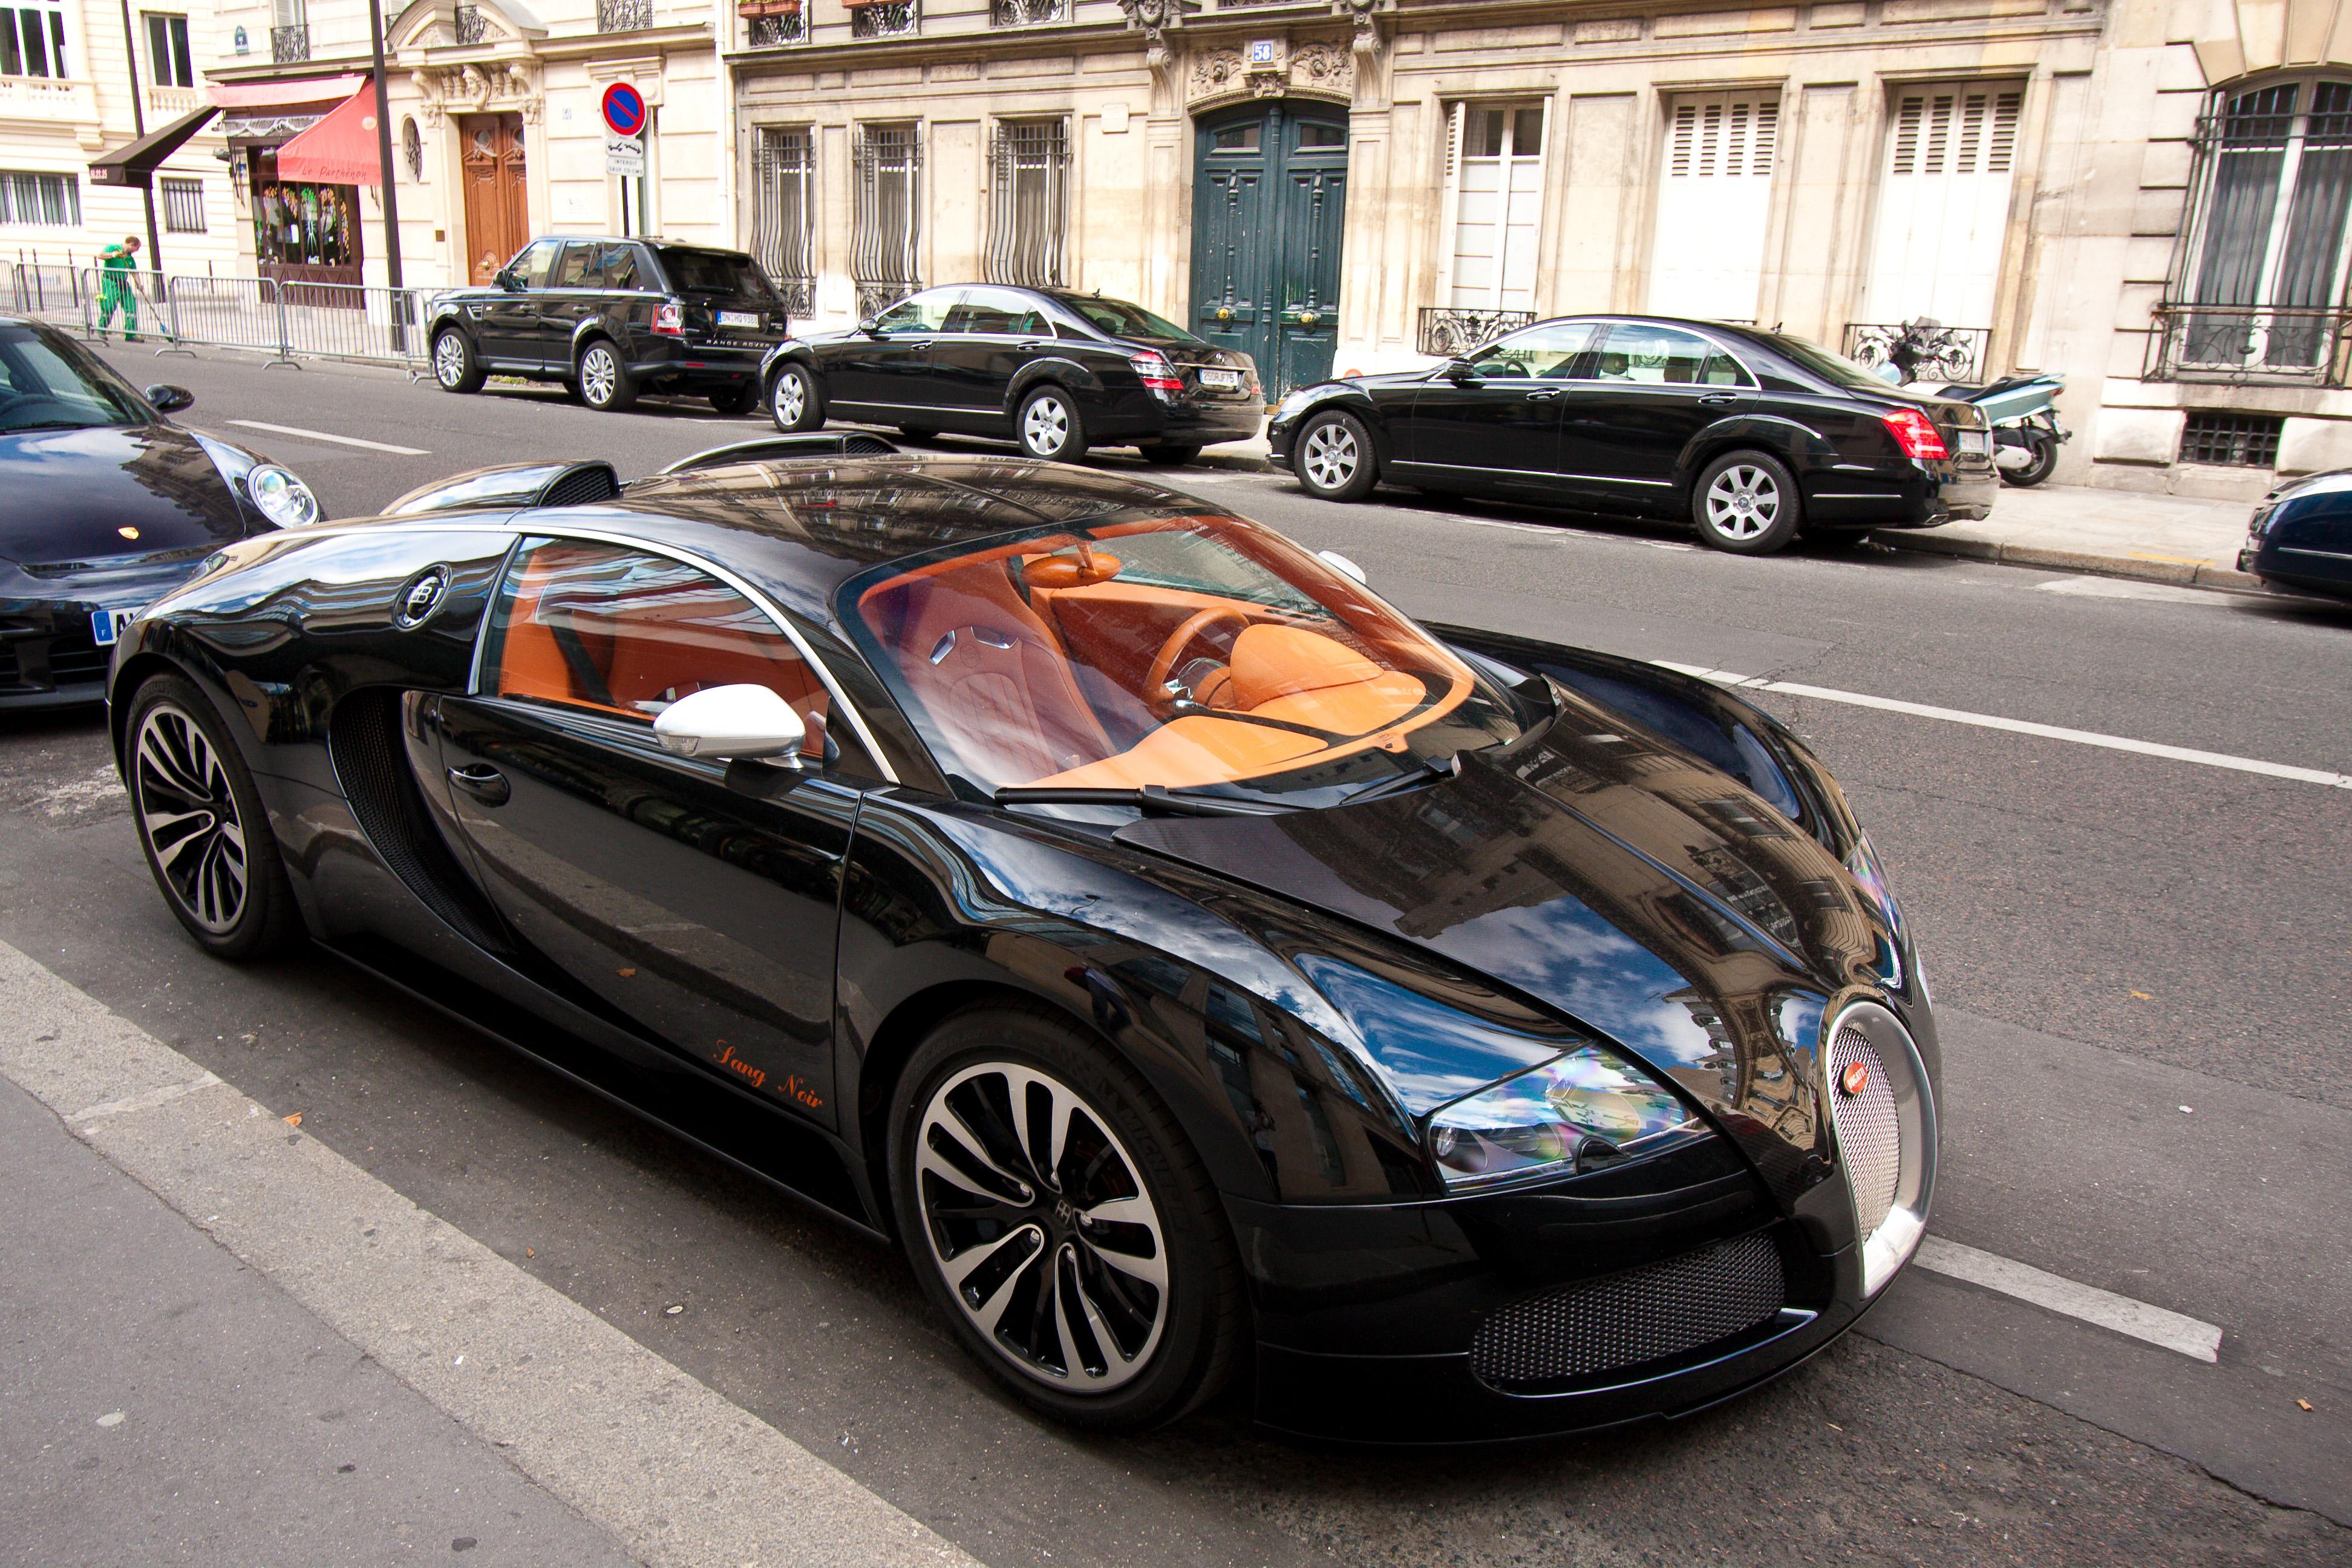 File:Bugatti Veyron sang noir.jpg - Wikimedia Commons